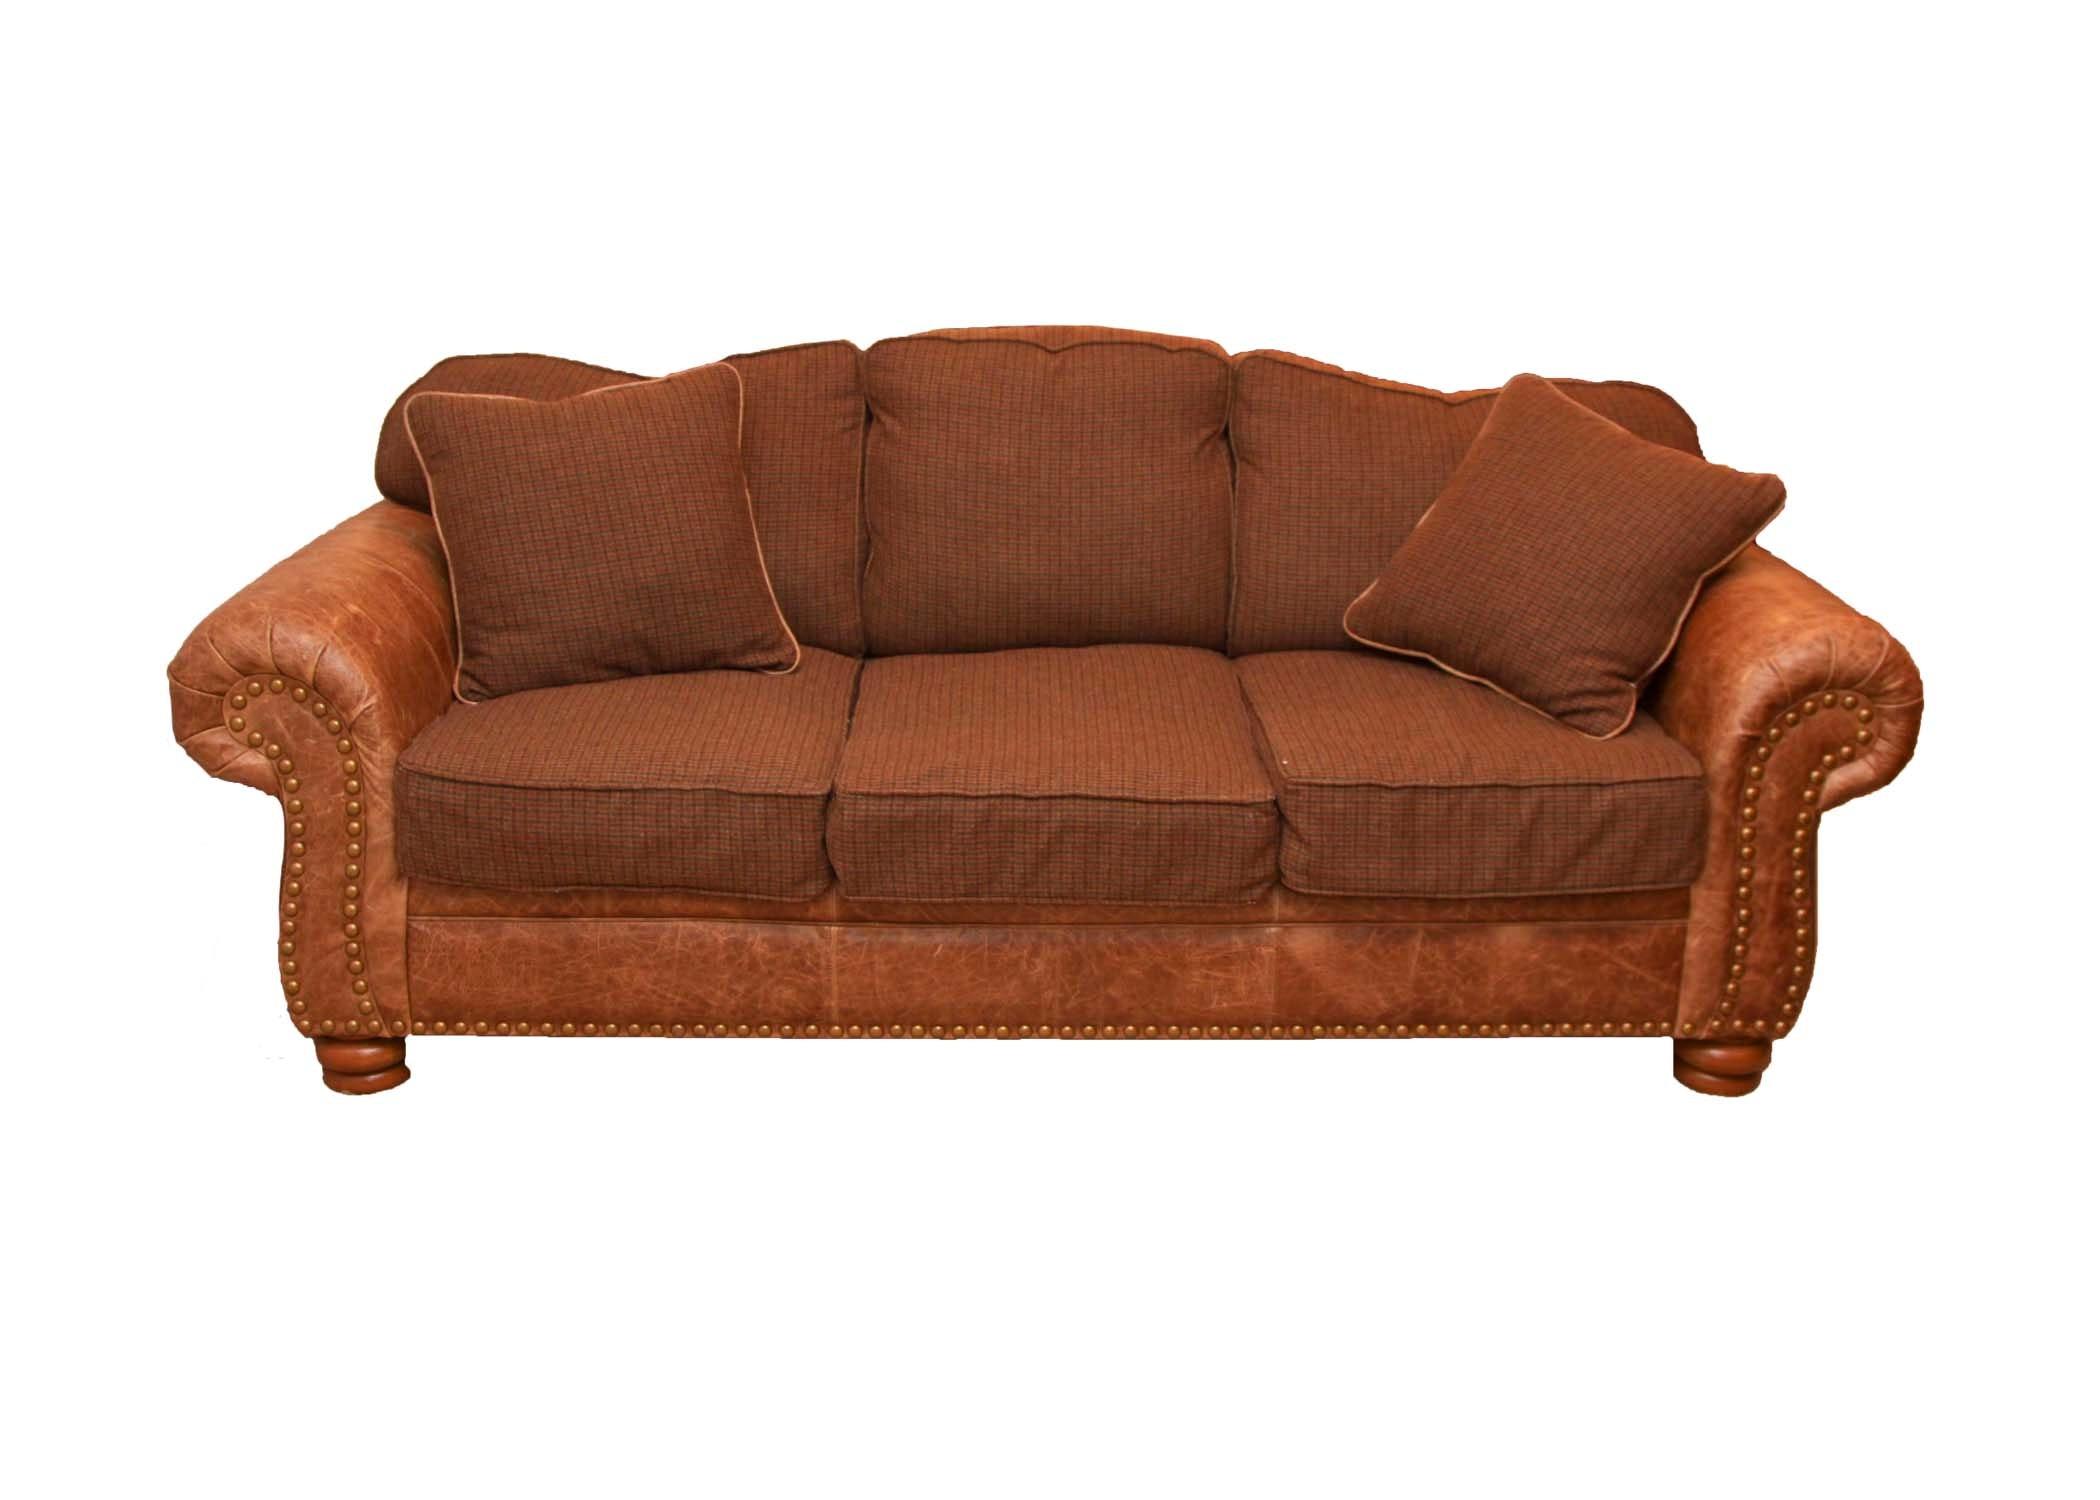 Marshfield Furniture Leather and Plaid Sofa